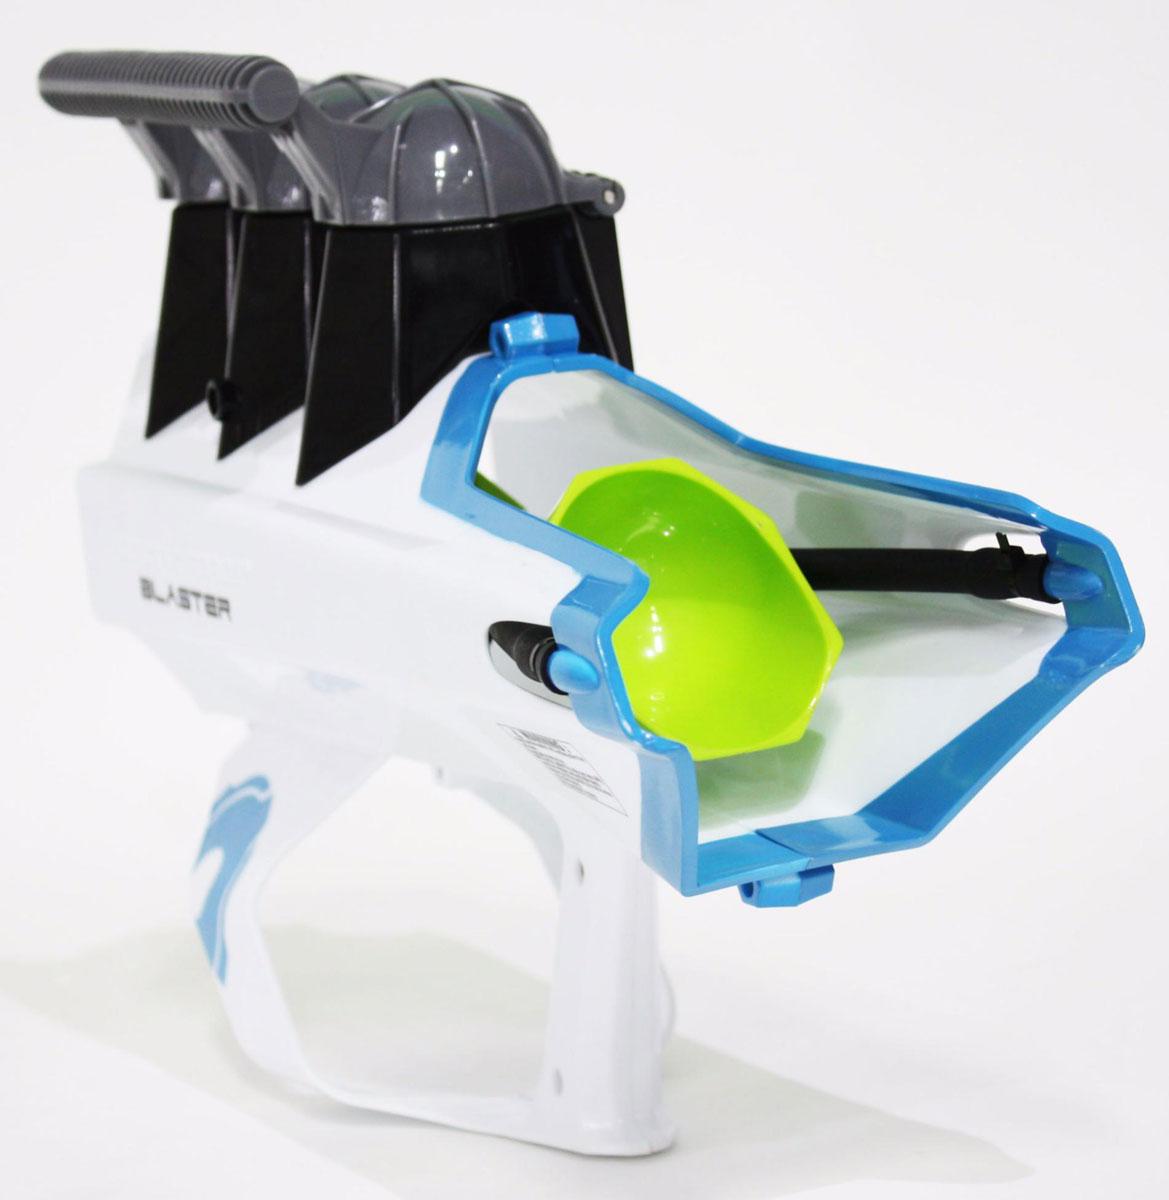 СнежкоБластер Тройной SnowBall Blaster, SB-38135 snowball